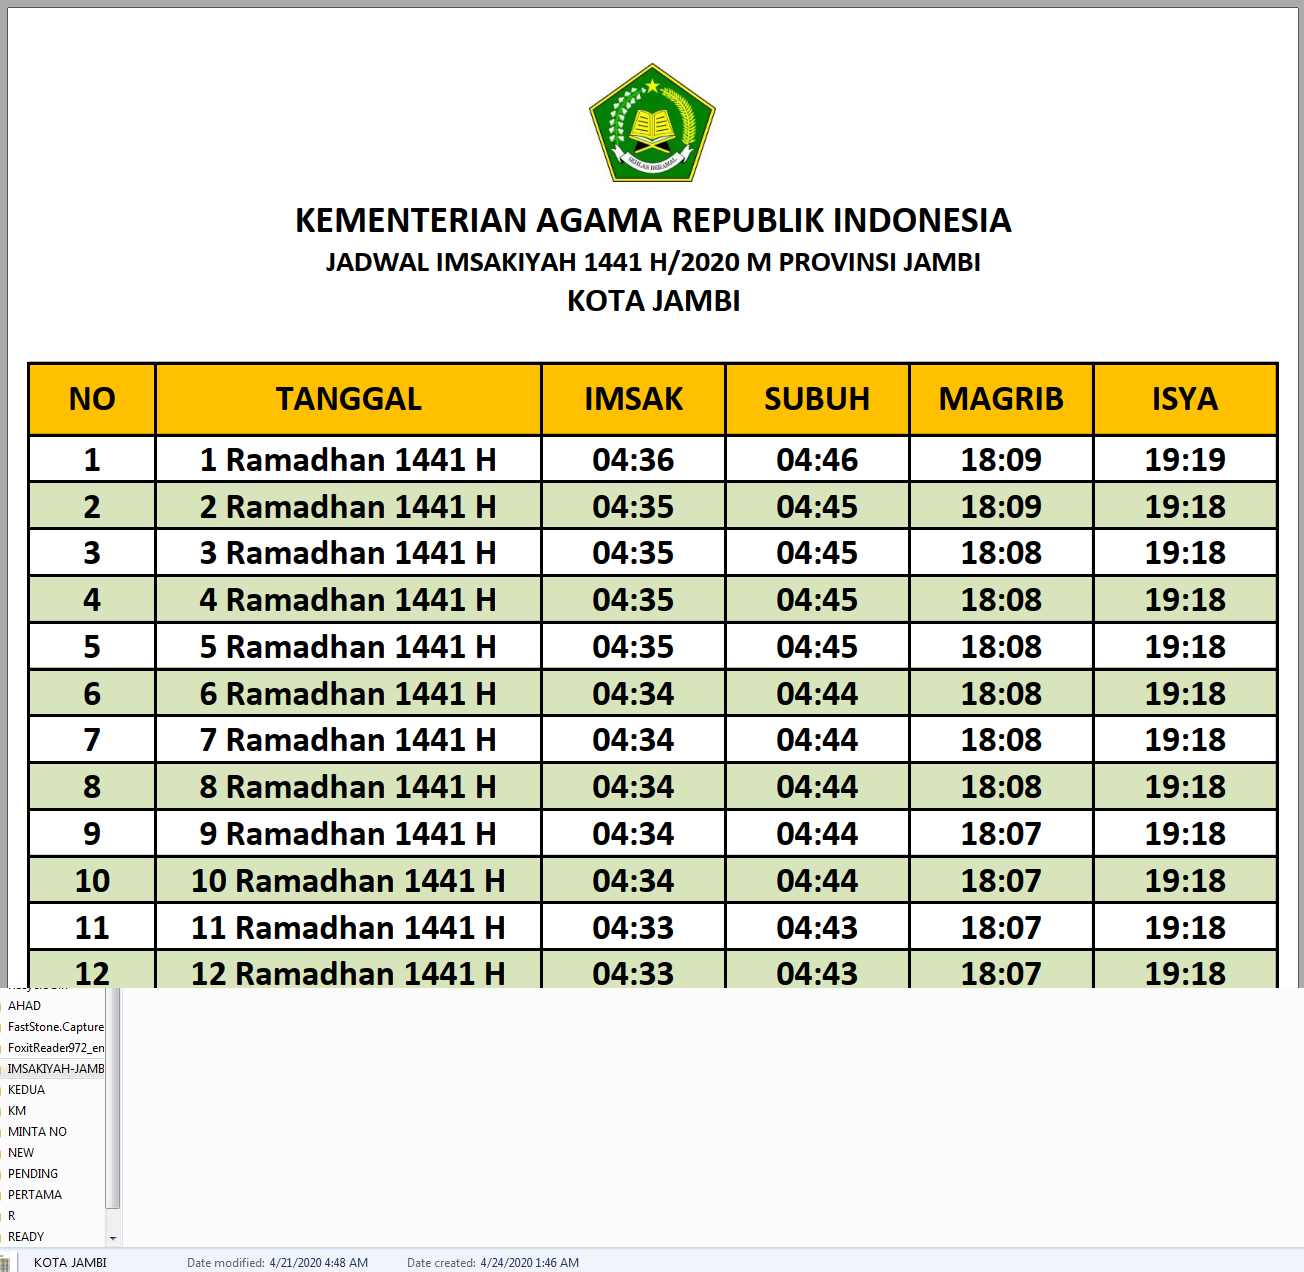 Jadwal Imsakiyah Jambi 2020